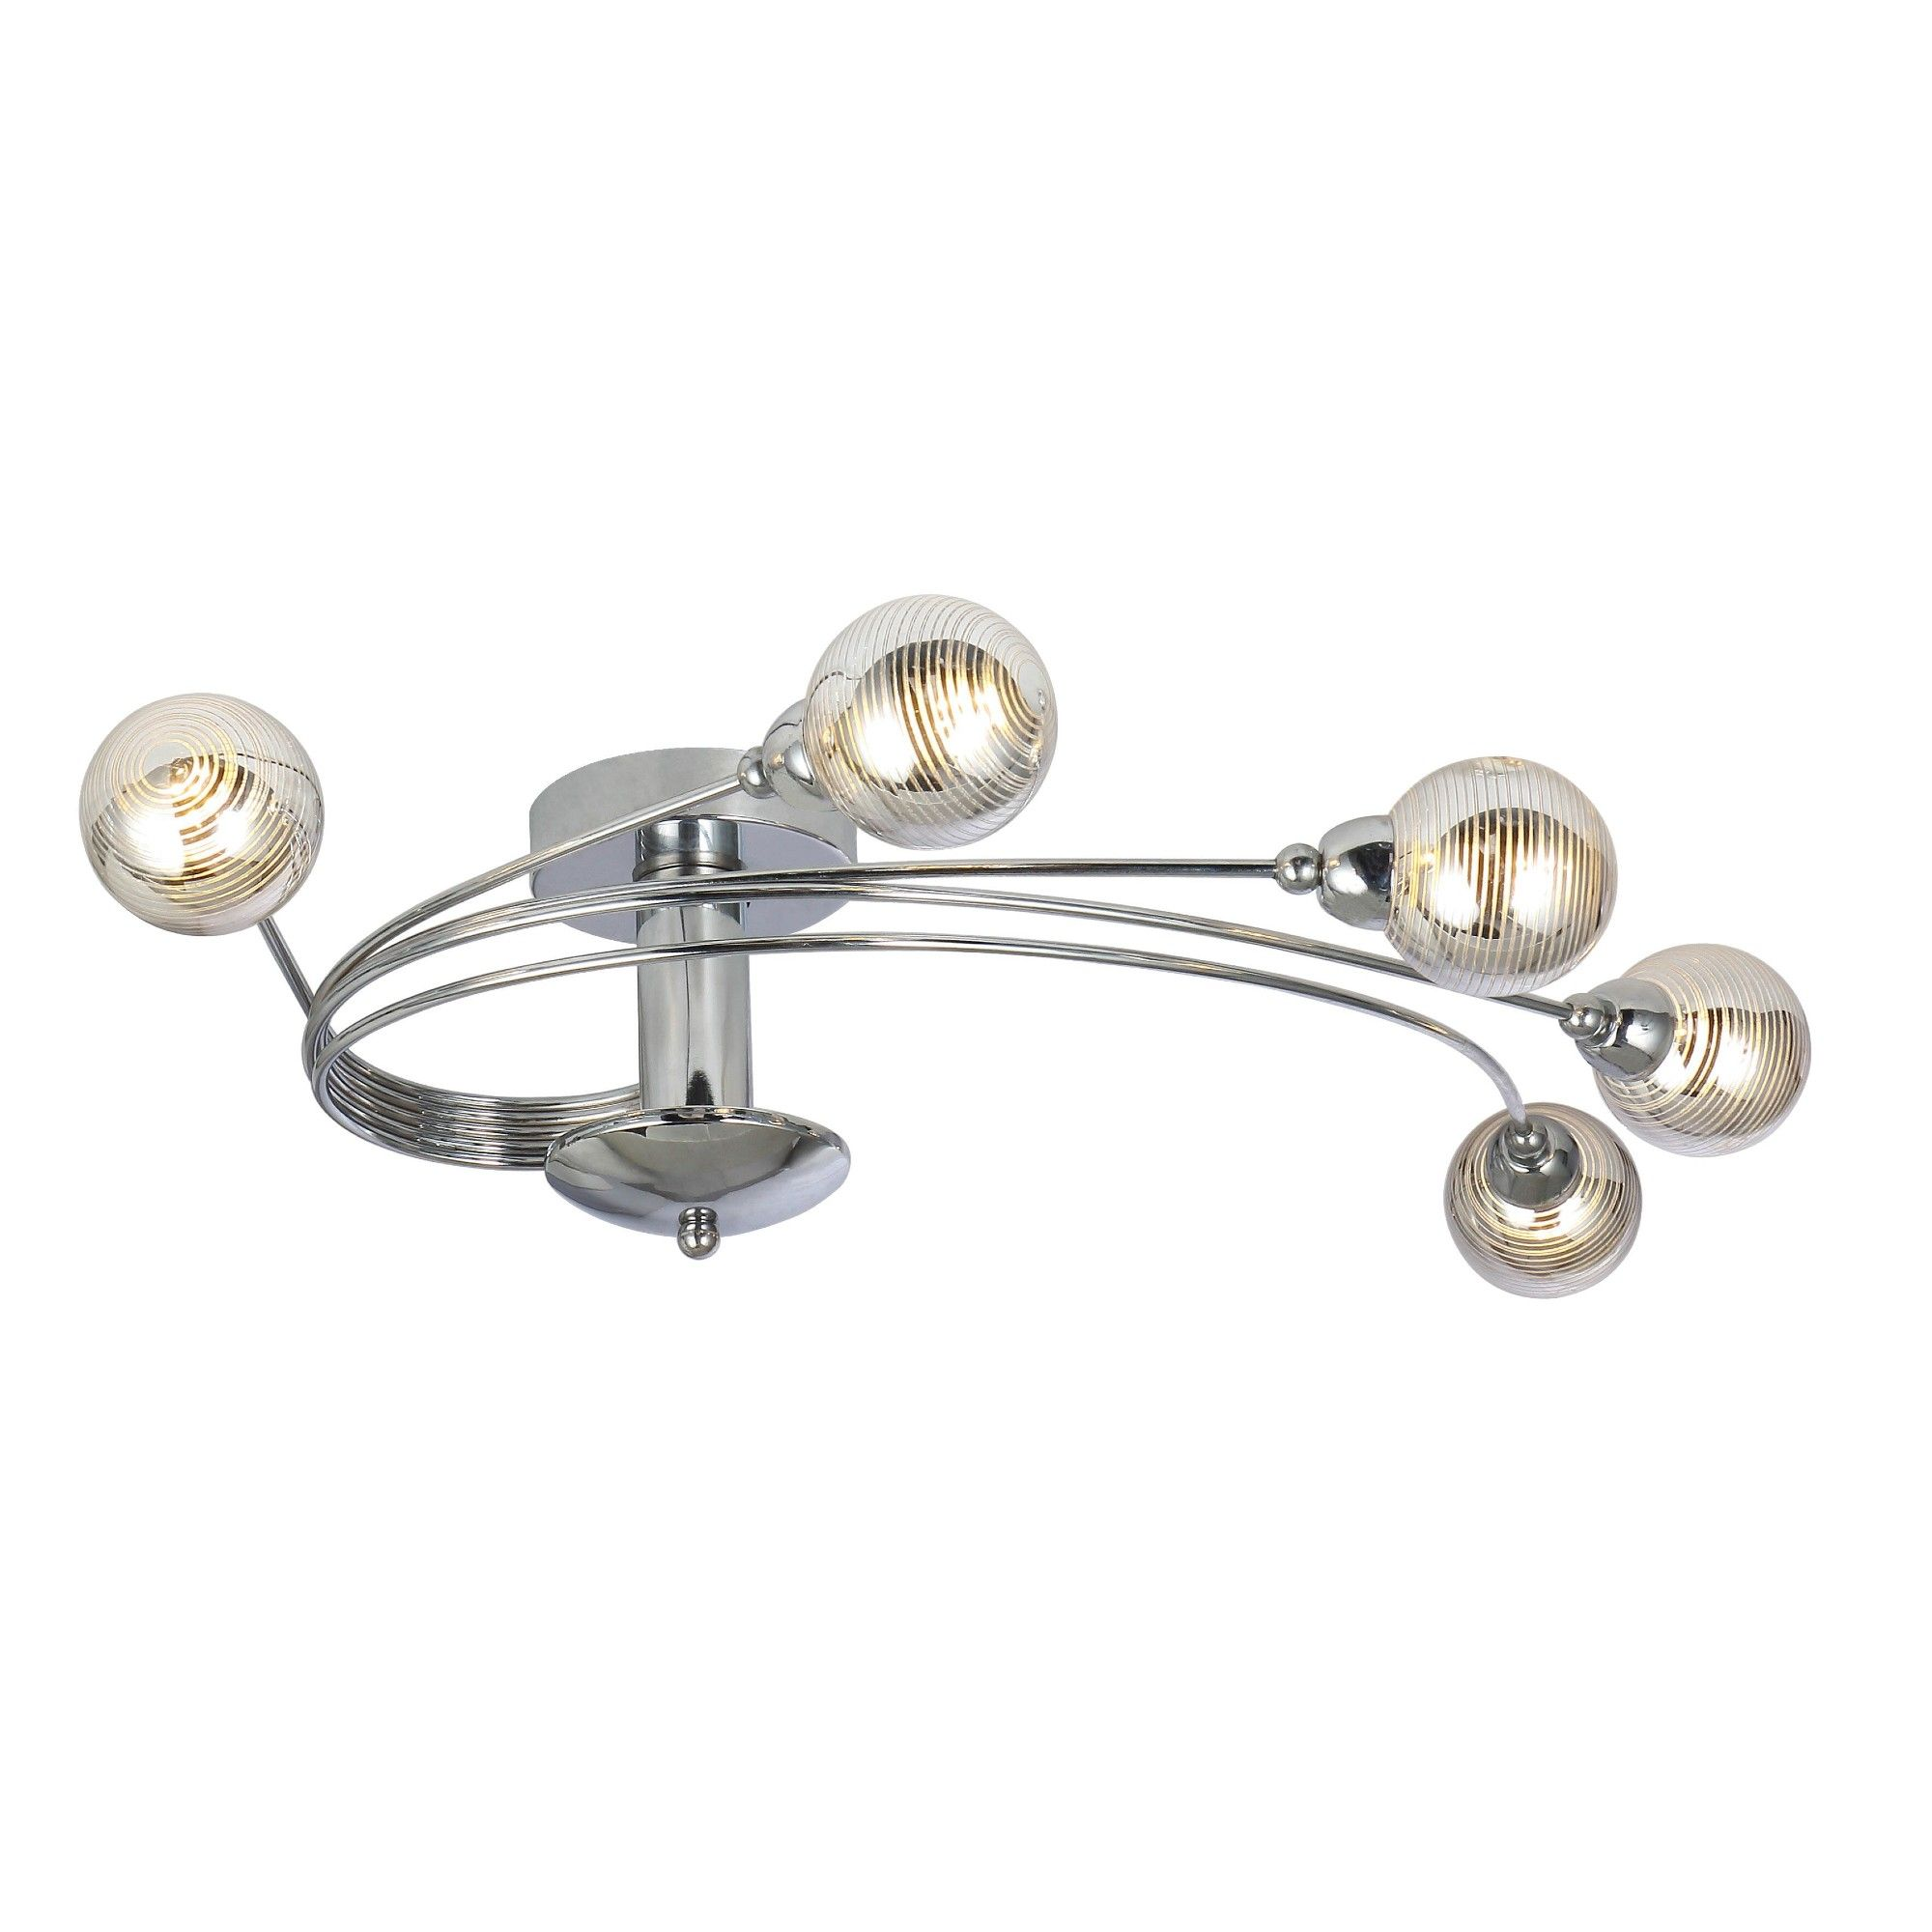 Tiia 5 Light Polished Chrome Semi Flush Ceiling Light